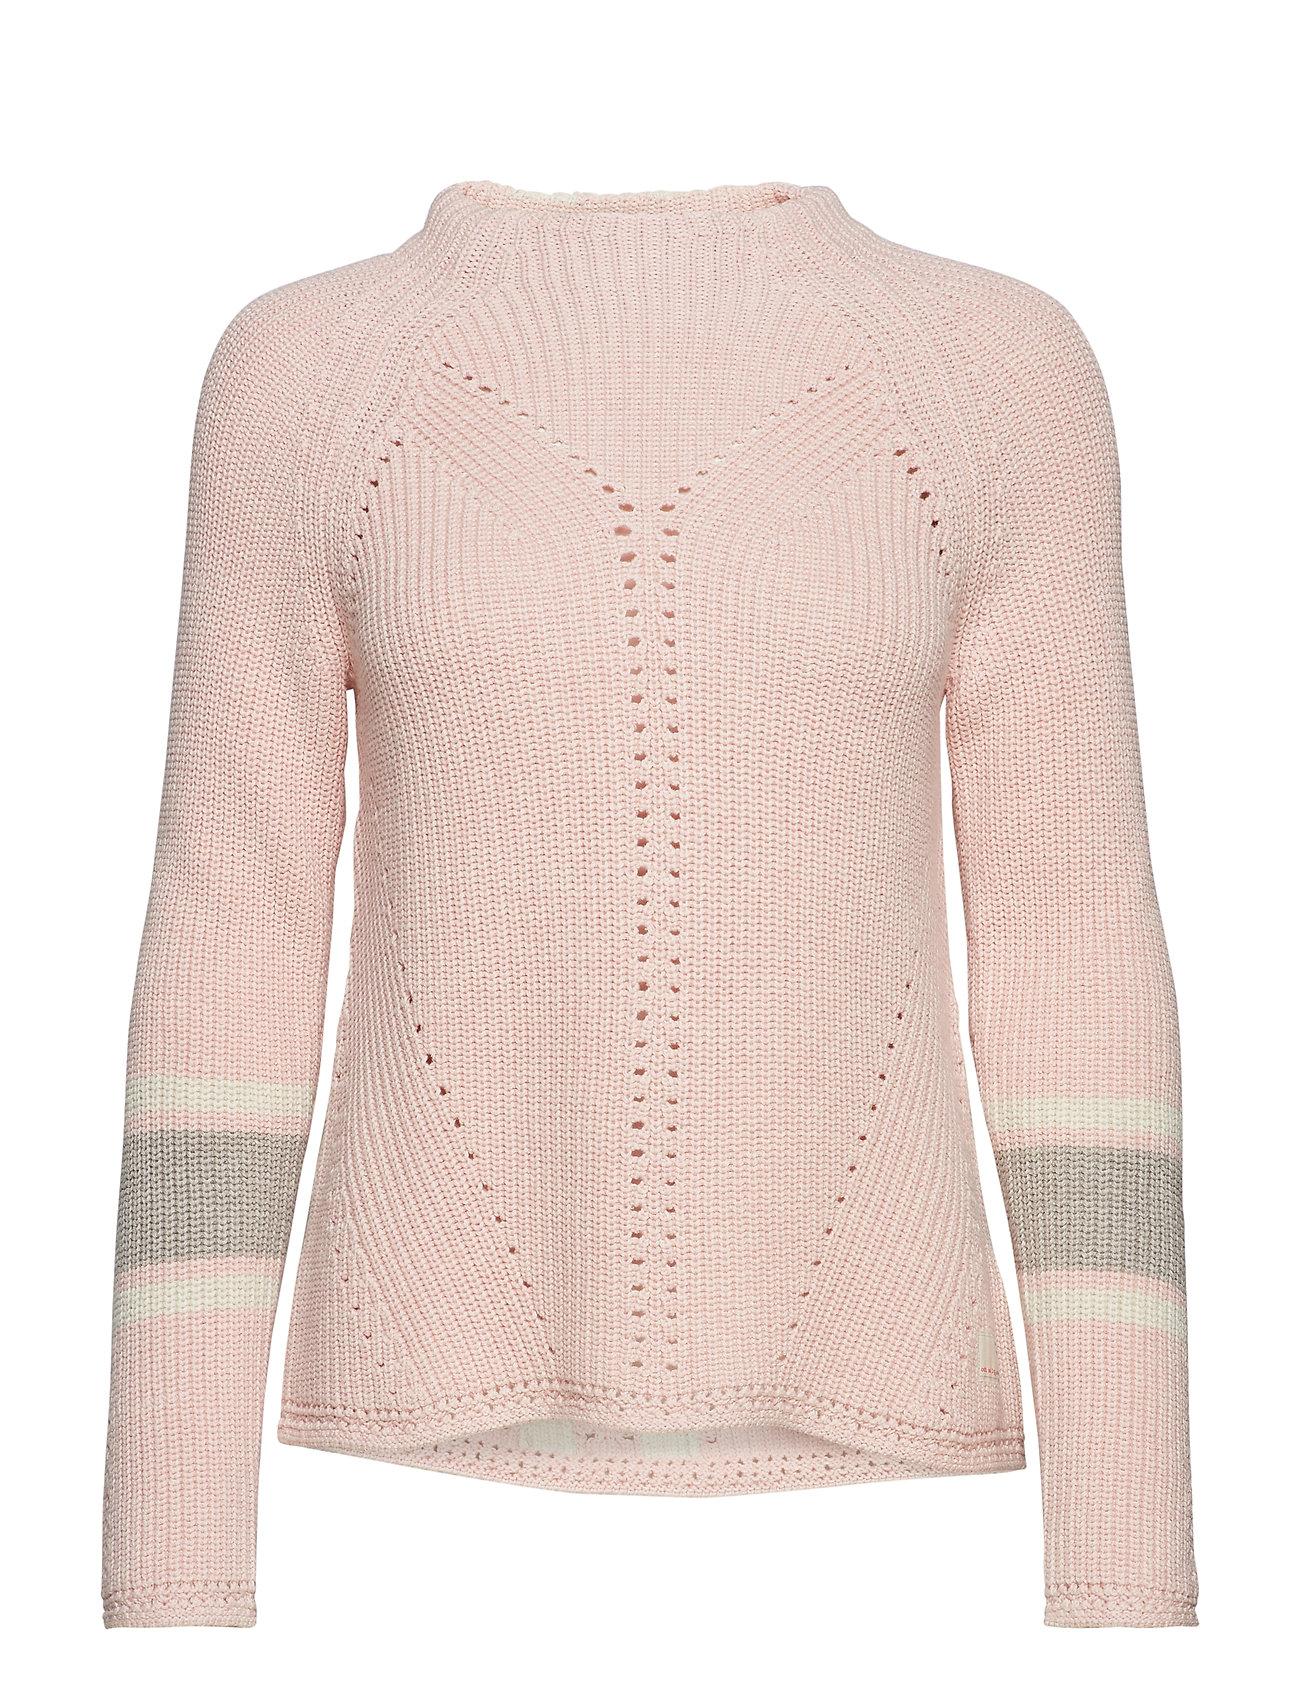 ODD MOLLY borderlands sweater